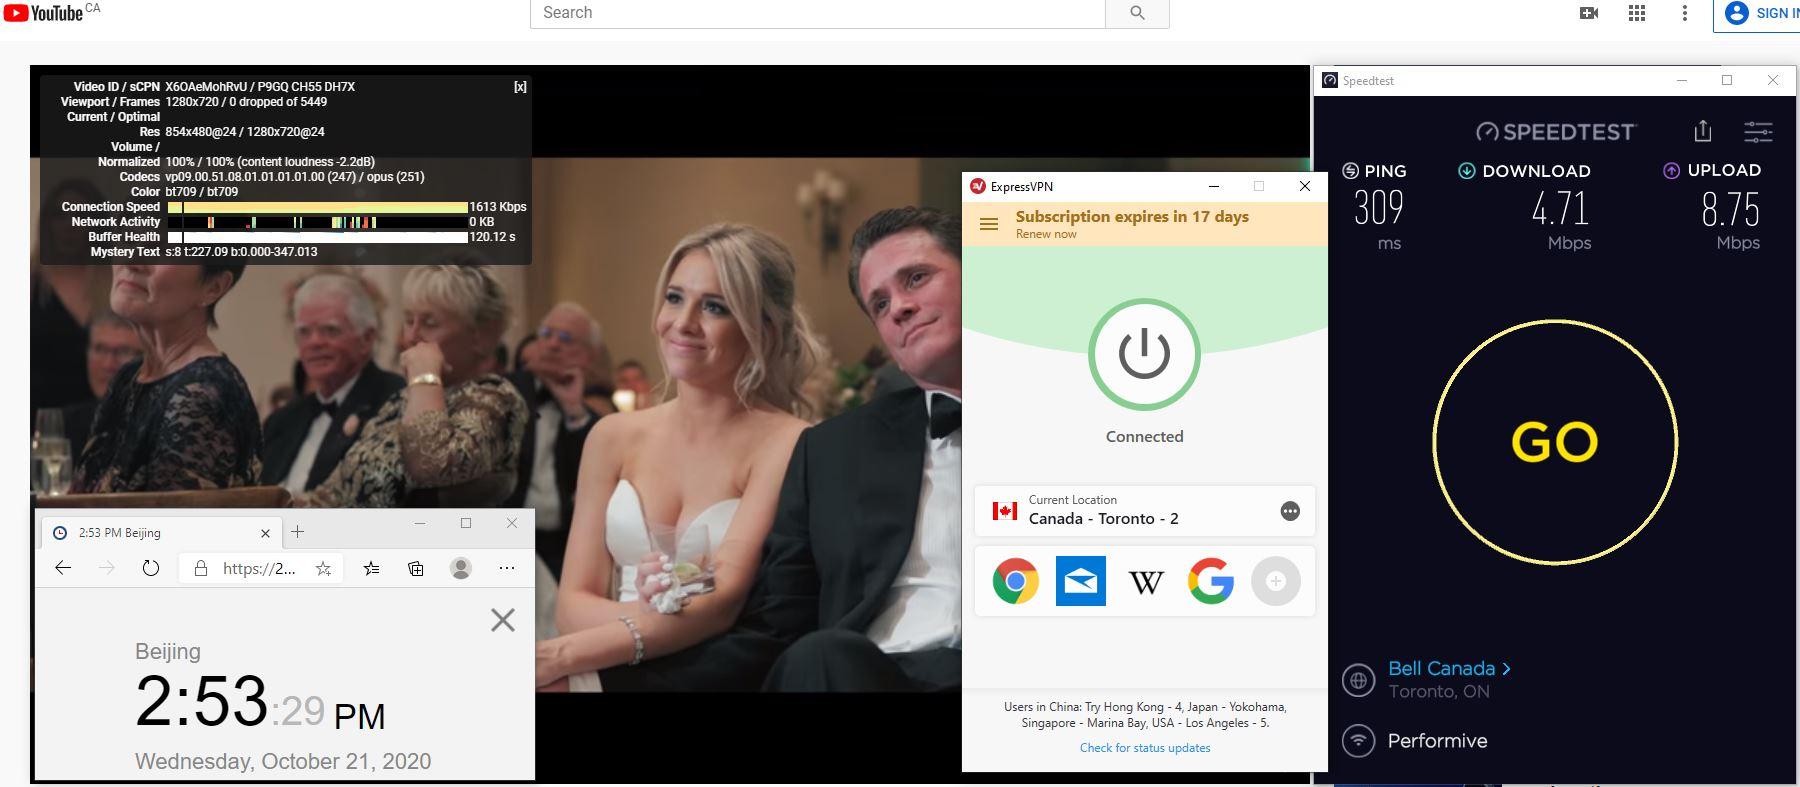 Windows10 ExpressVPN IKEv2 Canada - Toronto - 2 服务器 中国VPN 翻墙 科学上网 翻墙速度测试 - 20201021